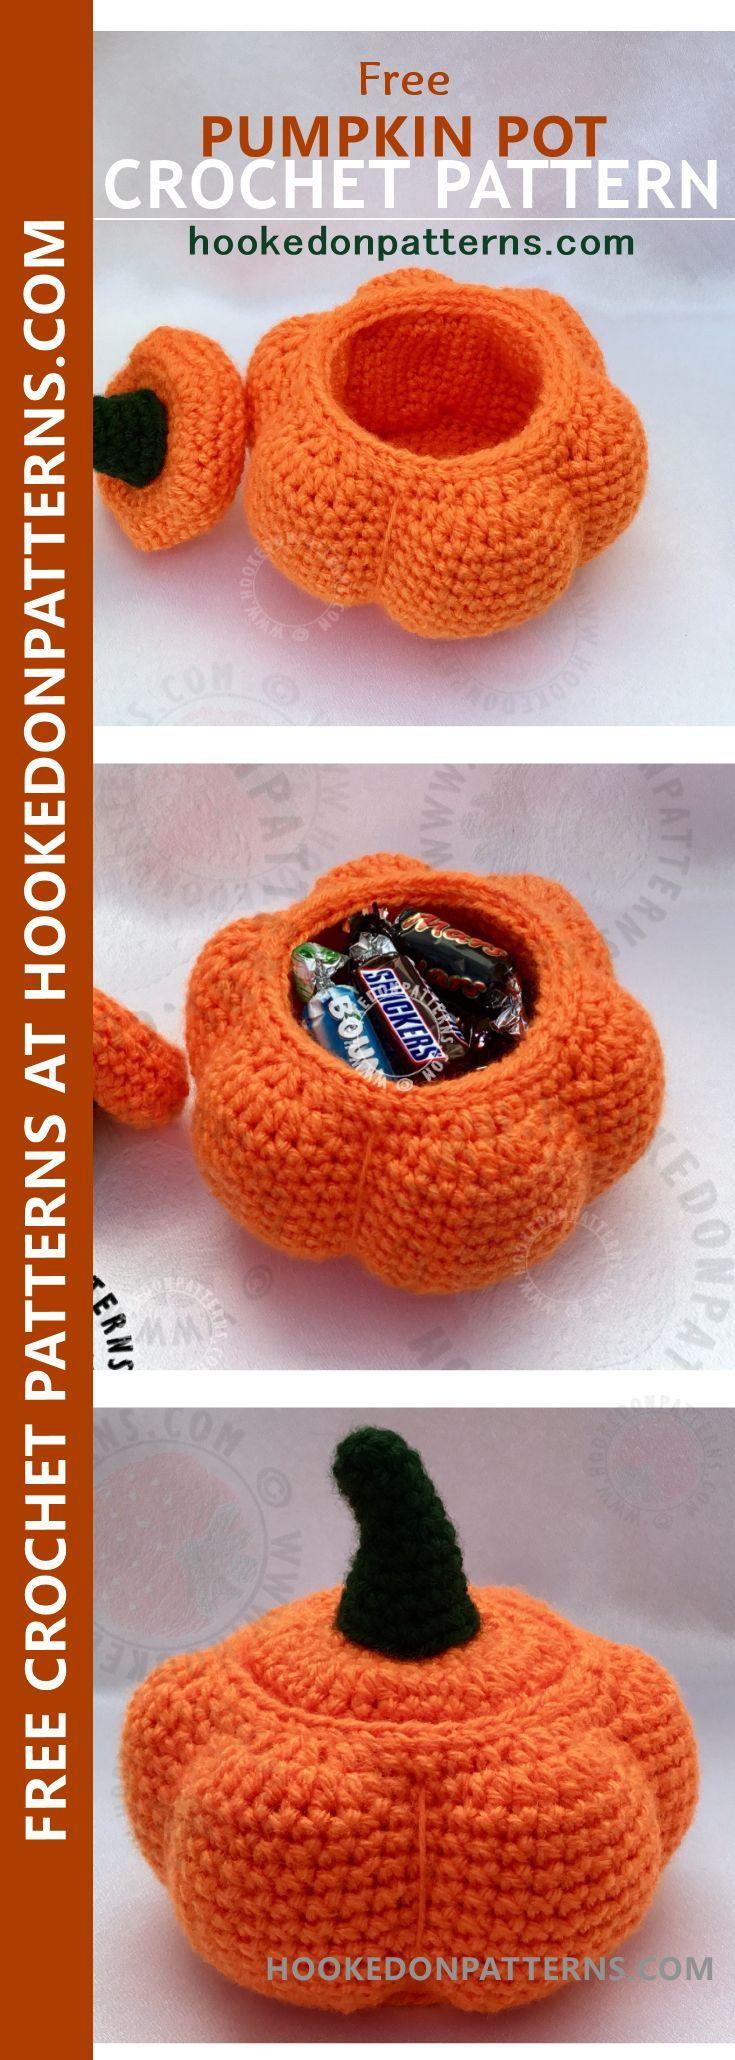 12 best Crochet - Home Decor images on Pinterest | Crochet ideas ...